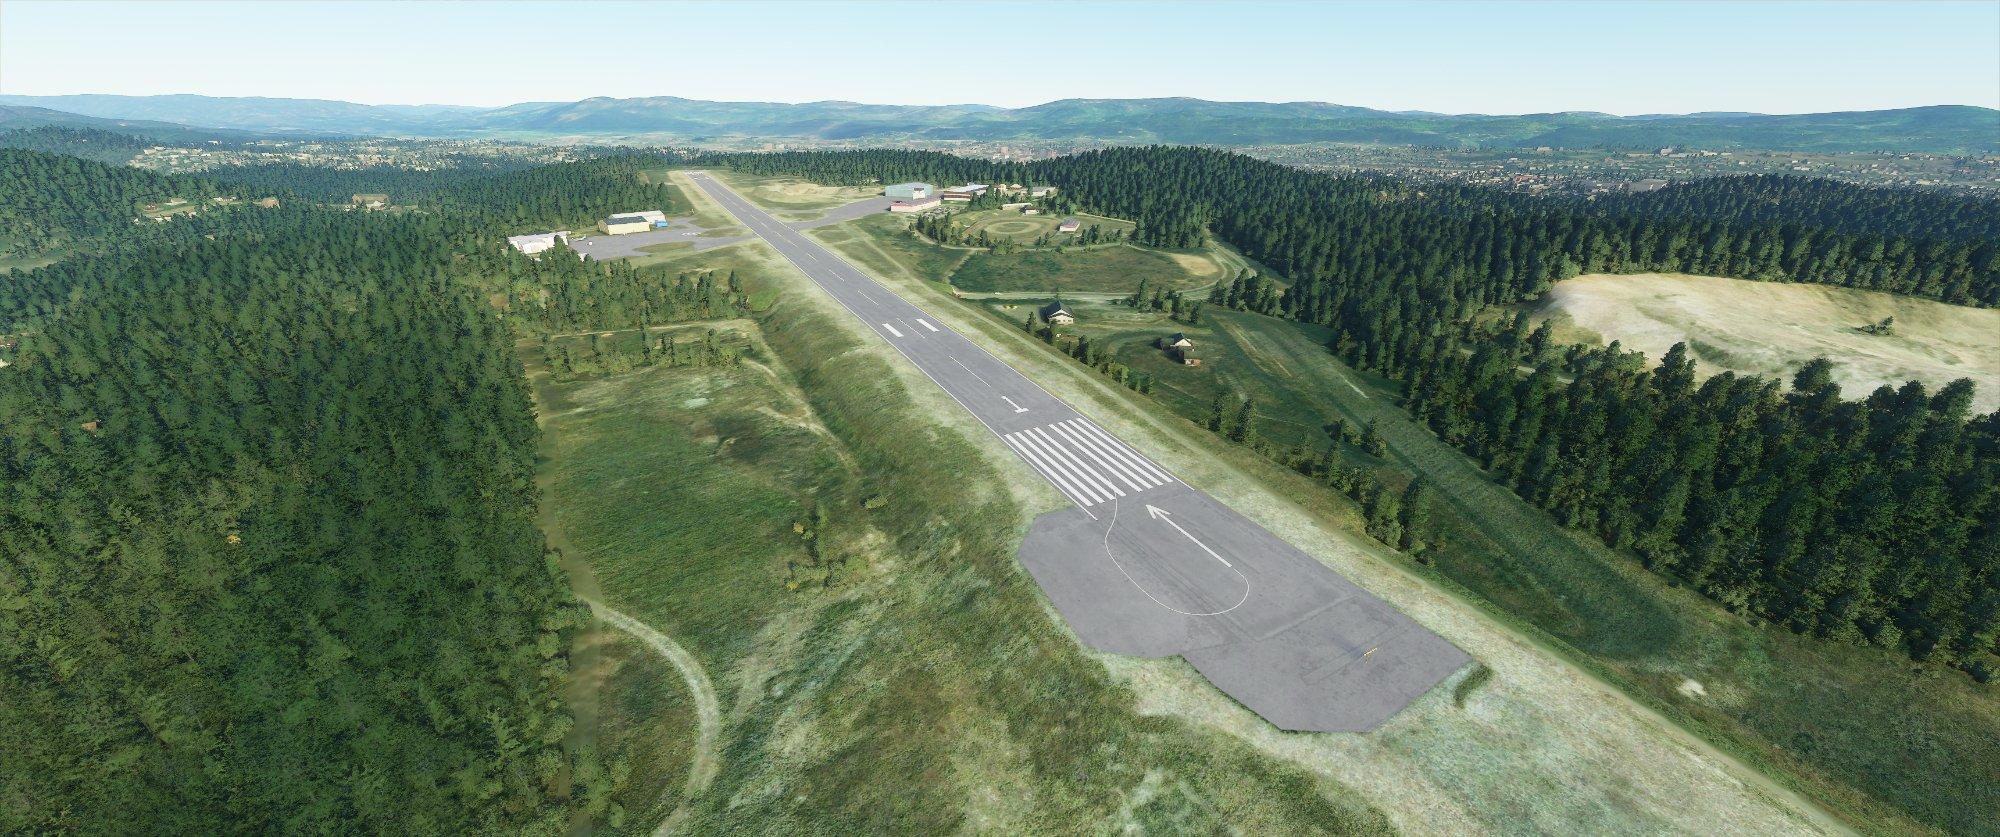 Microsoft Flight Simulator Screenshot 2020.10.27 - 18.37.36.07.jpg